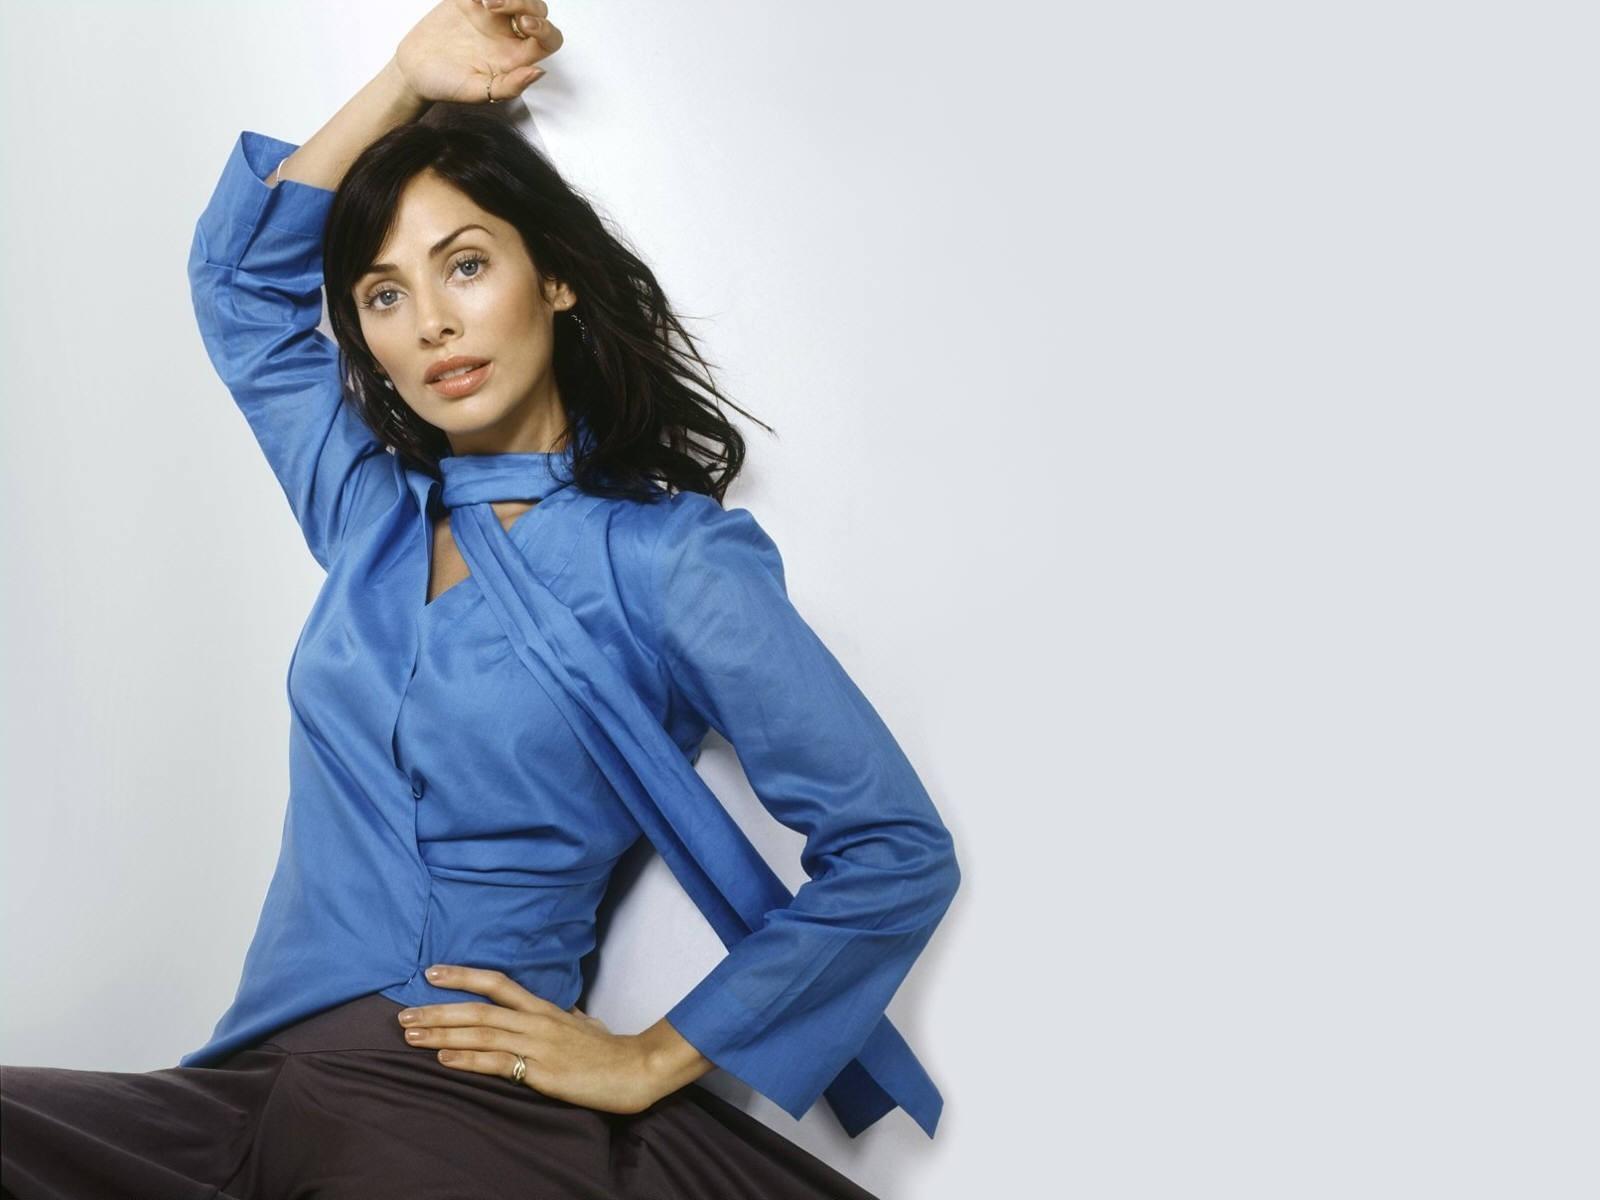 Wallpaper di Natalie Imbruglia vestita d'azzurro